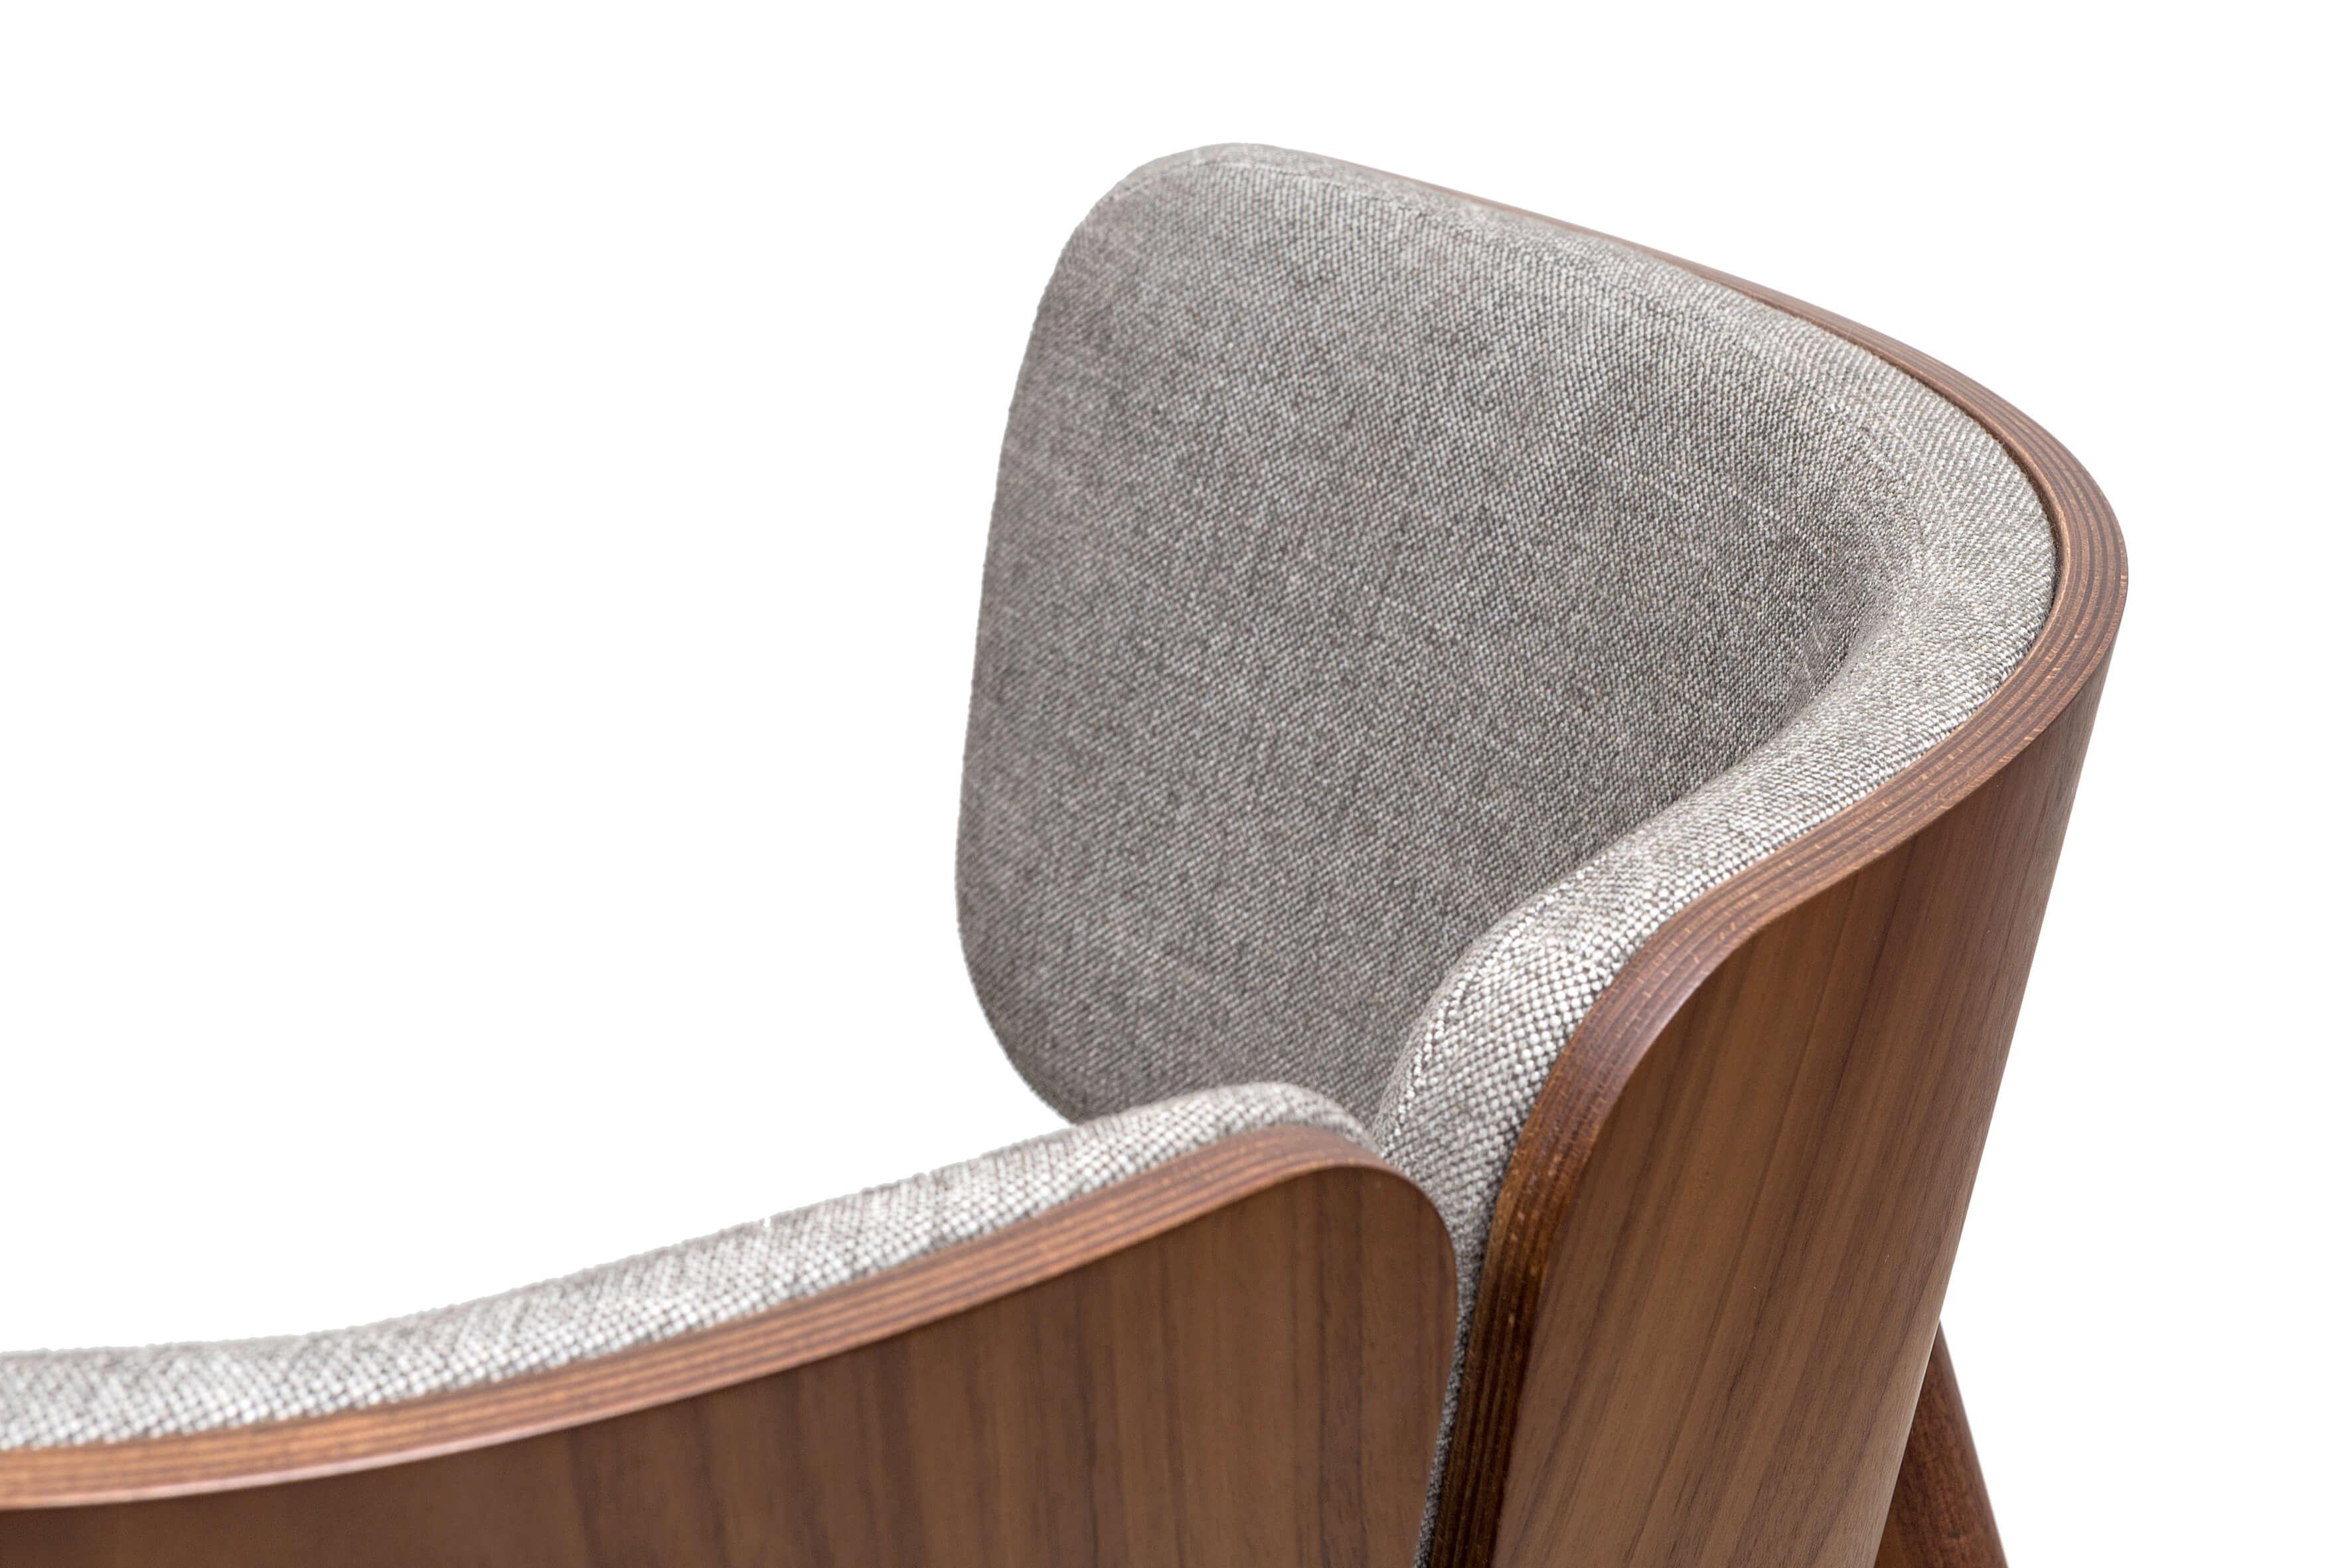 Wood-oo 010 Chair